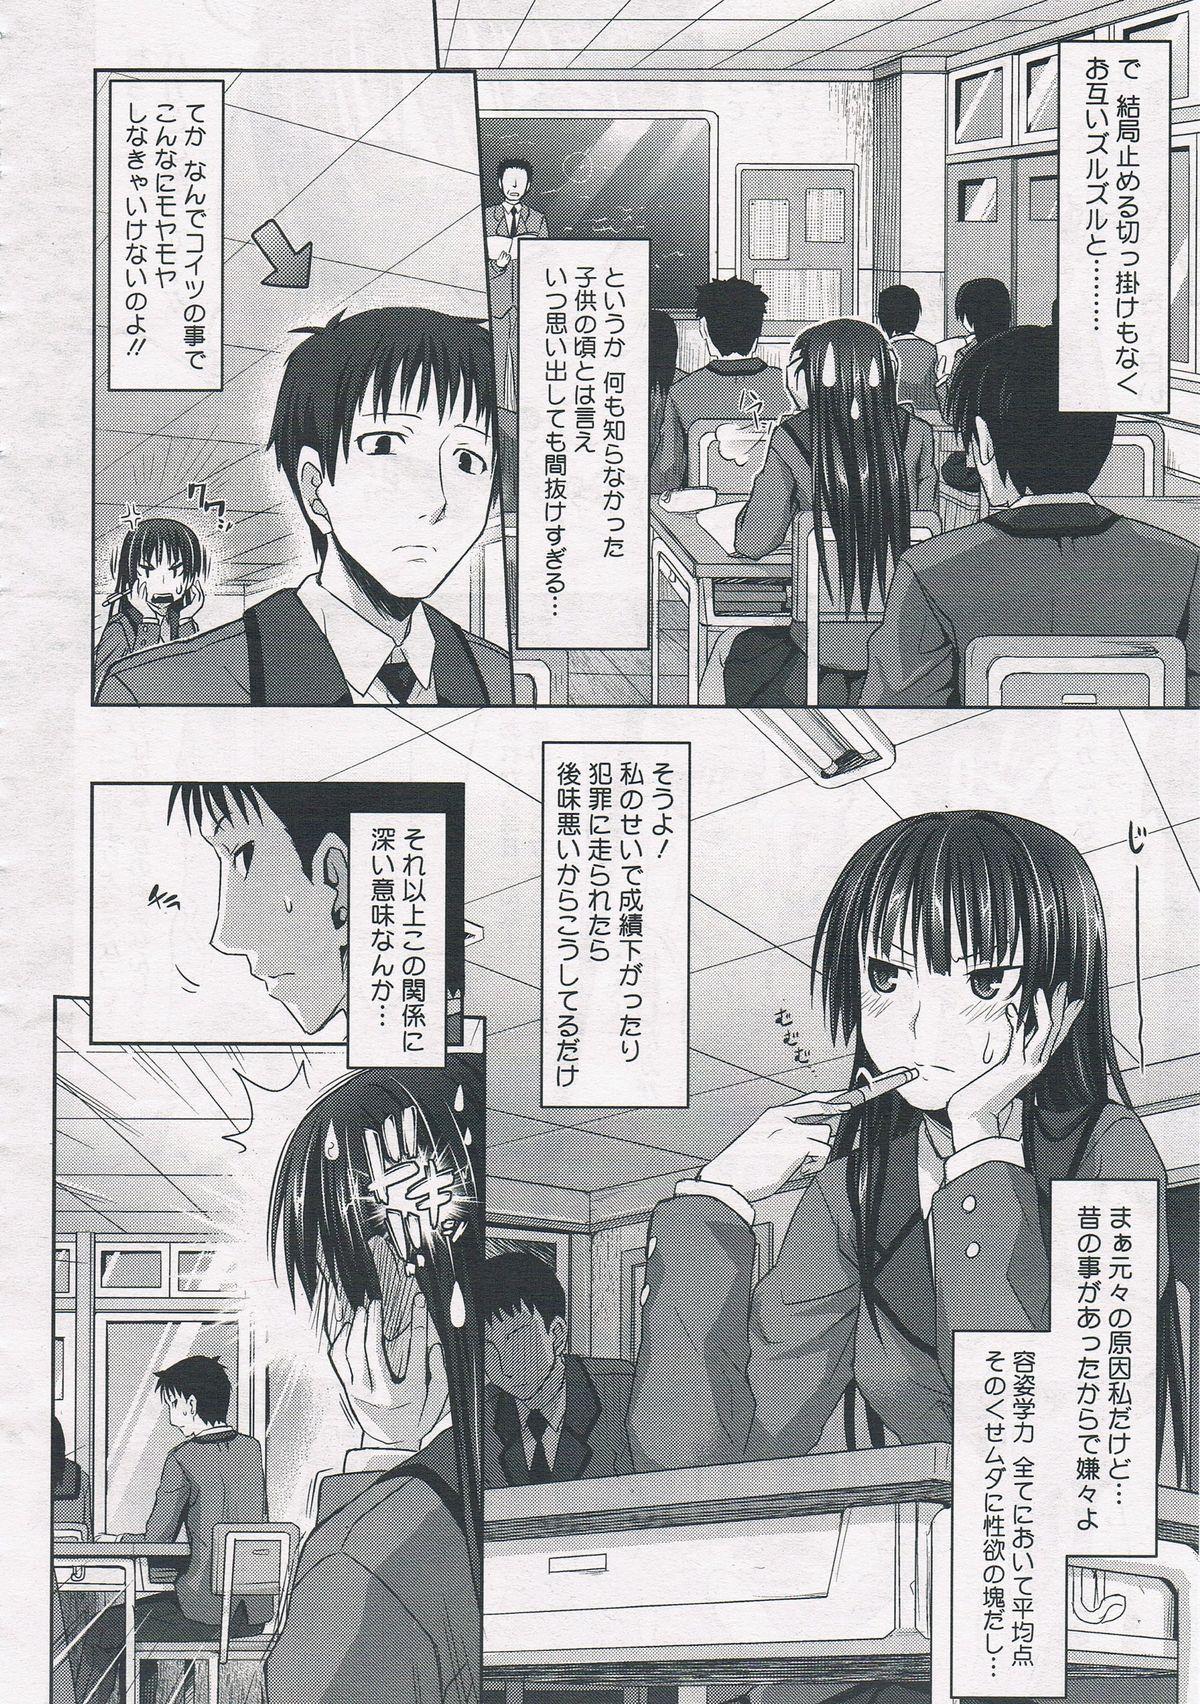 Migite no koibito COMIC Megastore 2012-07 5